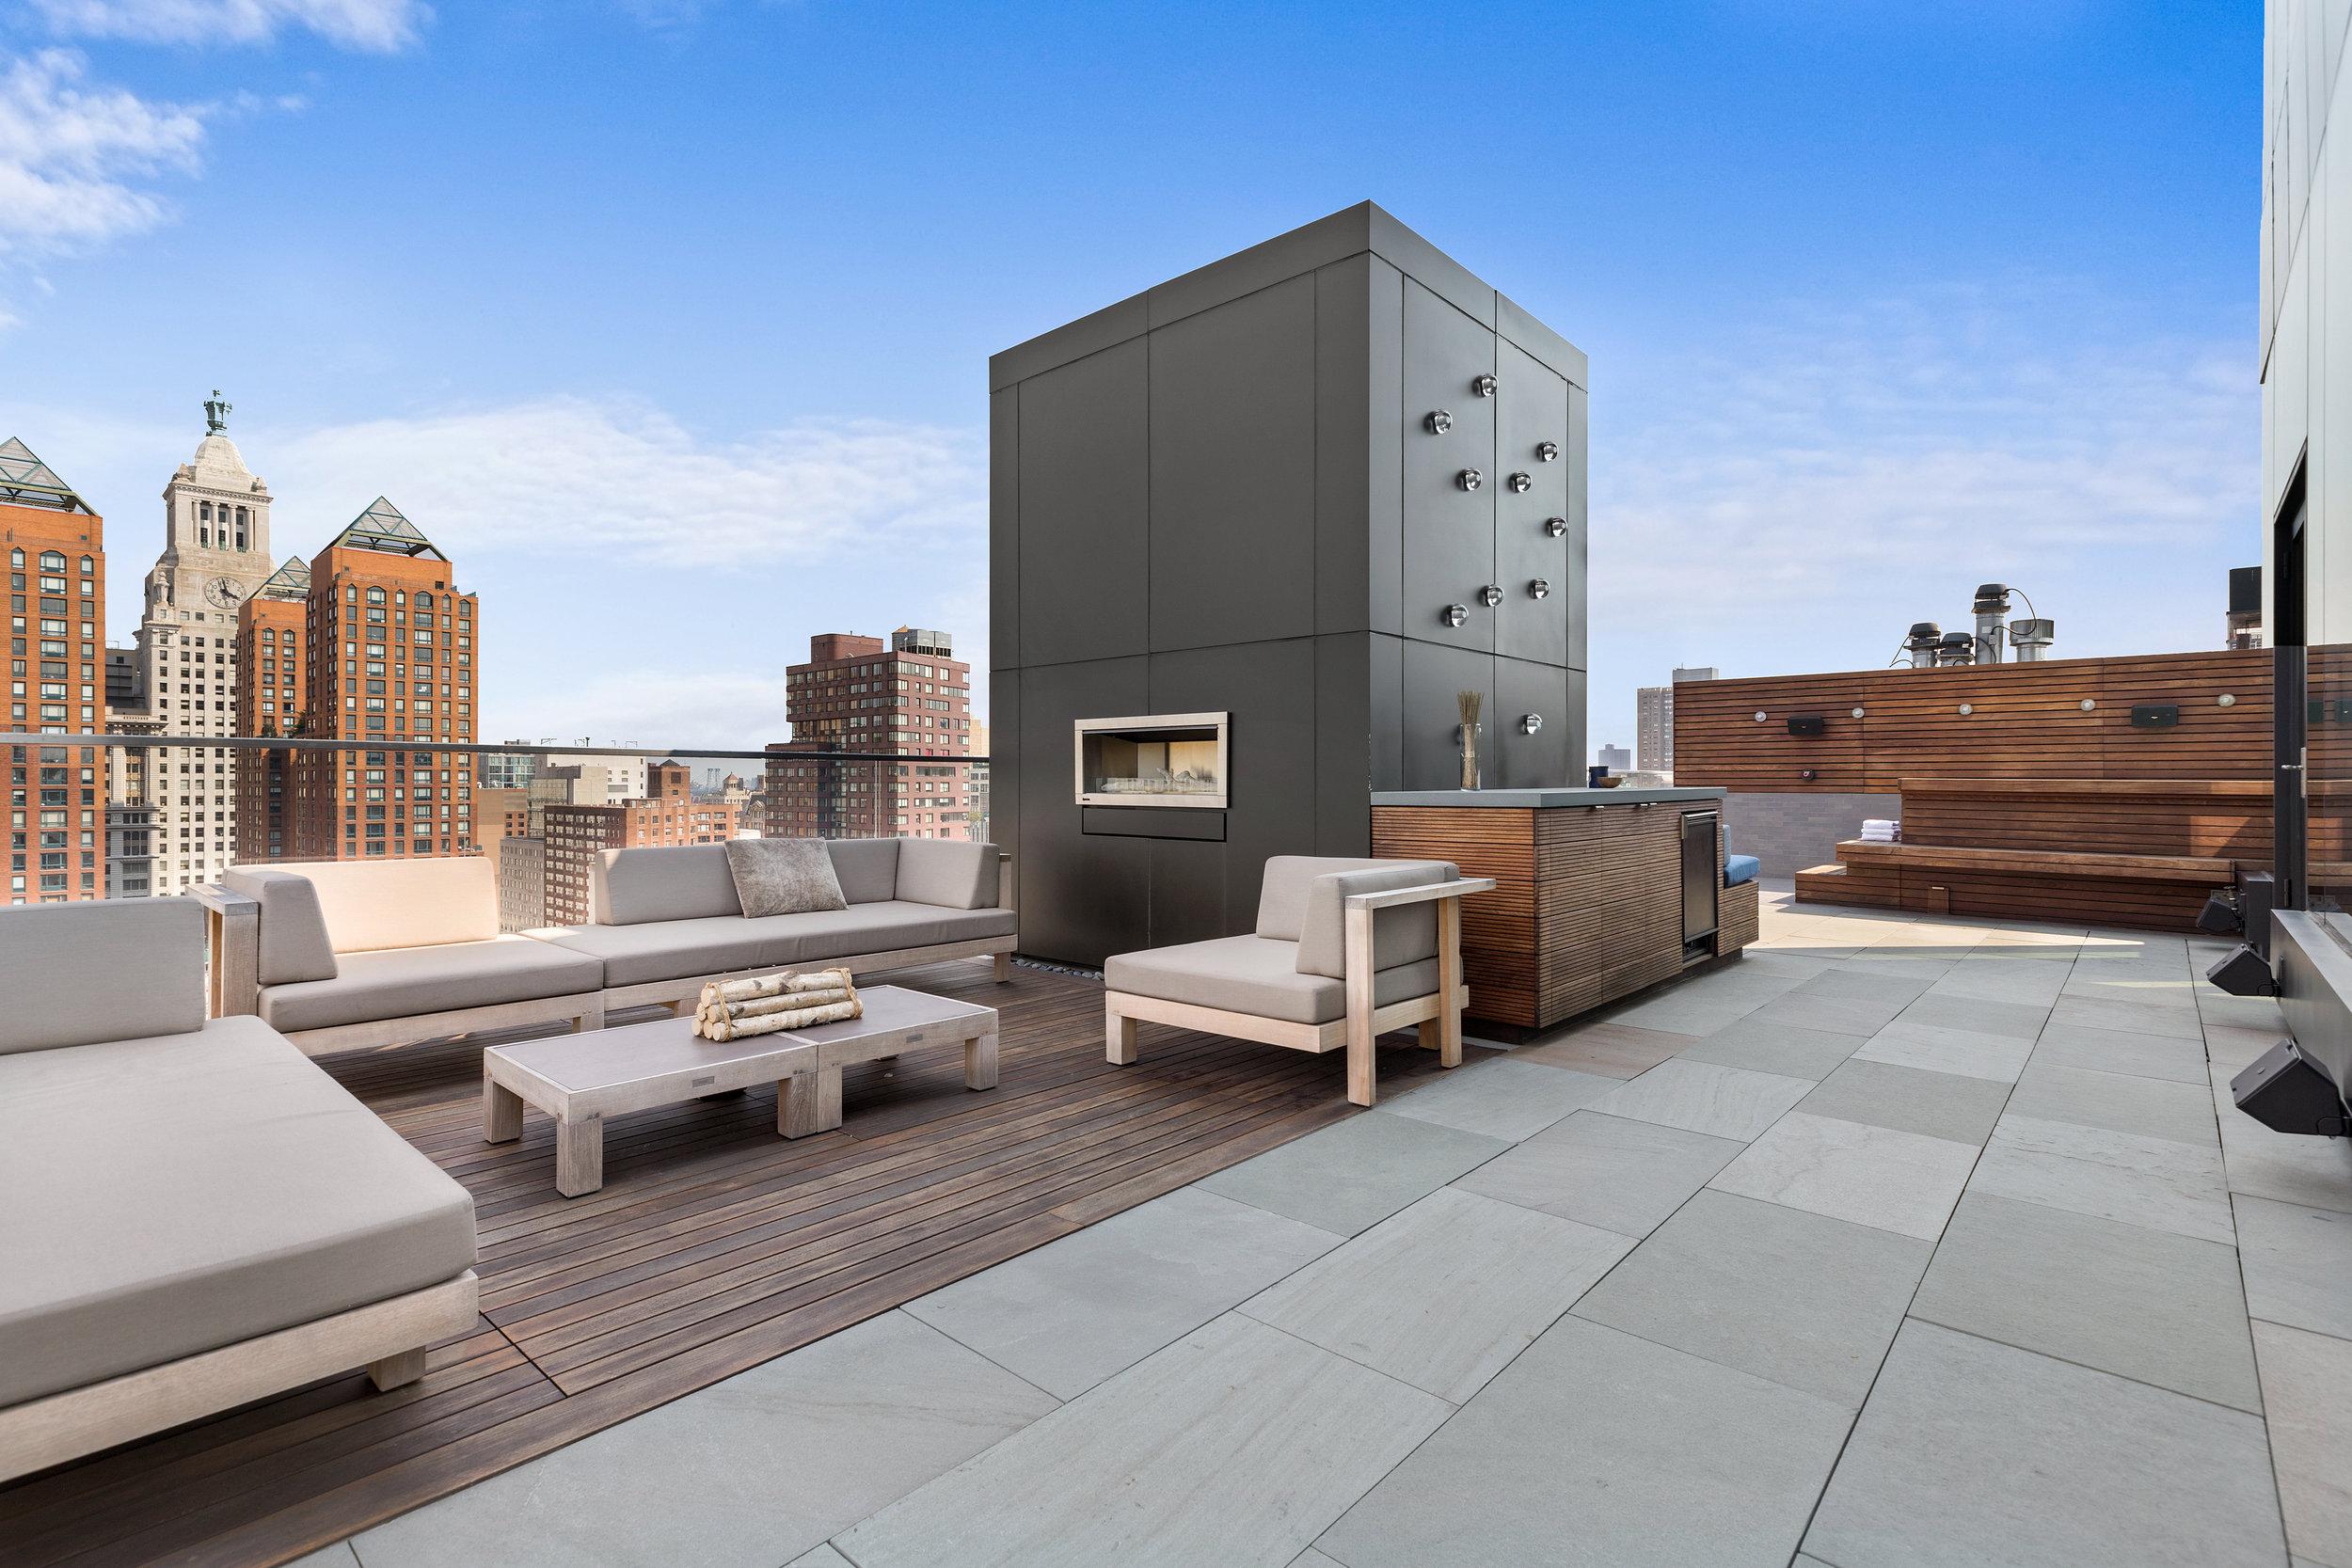 15 Union Square W New York NY - Josh Goetz Photography -9.JPG